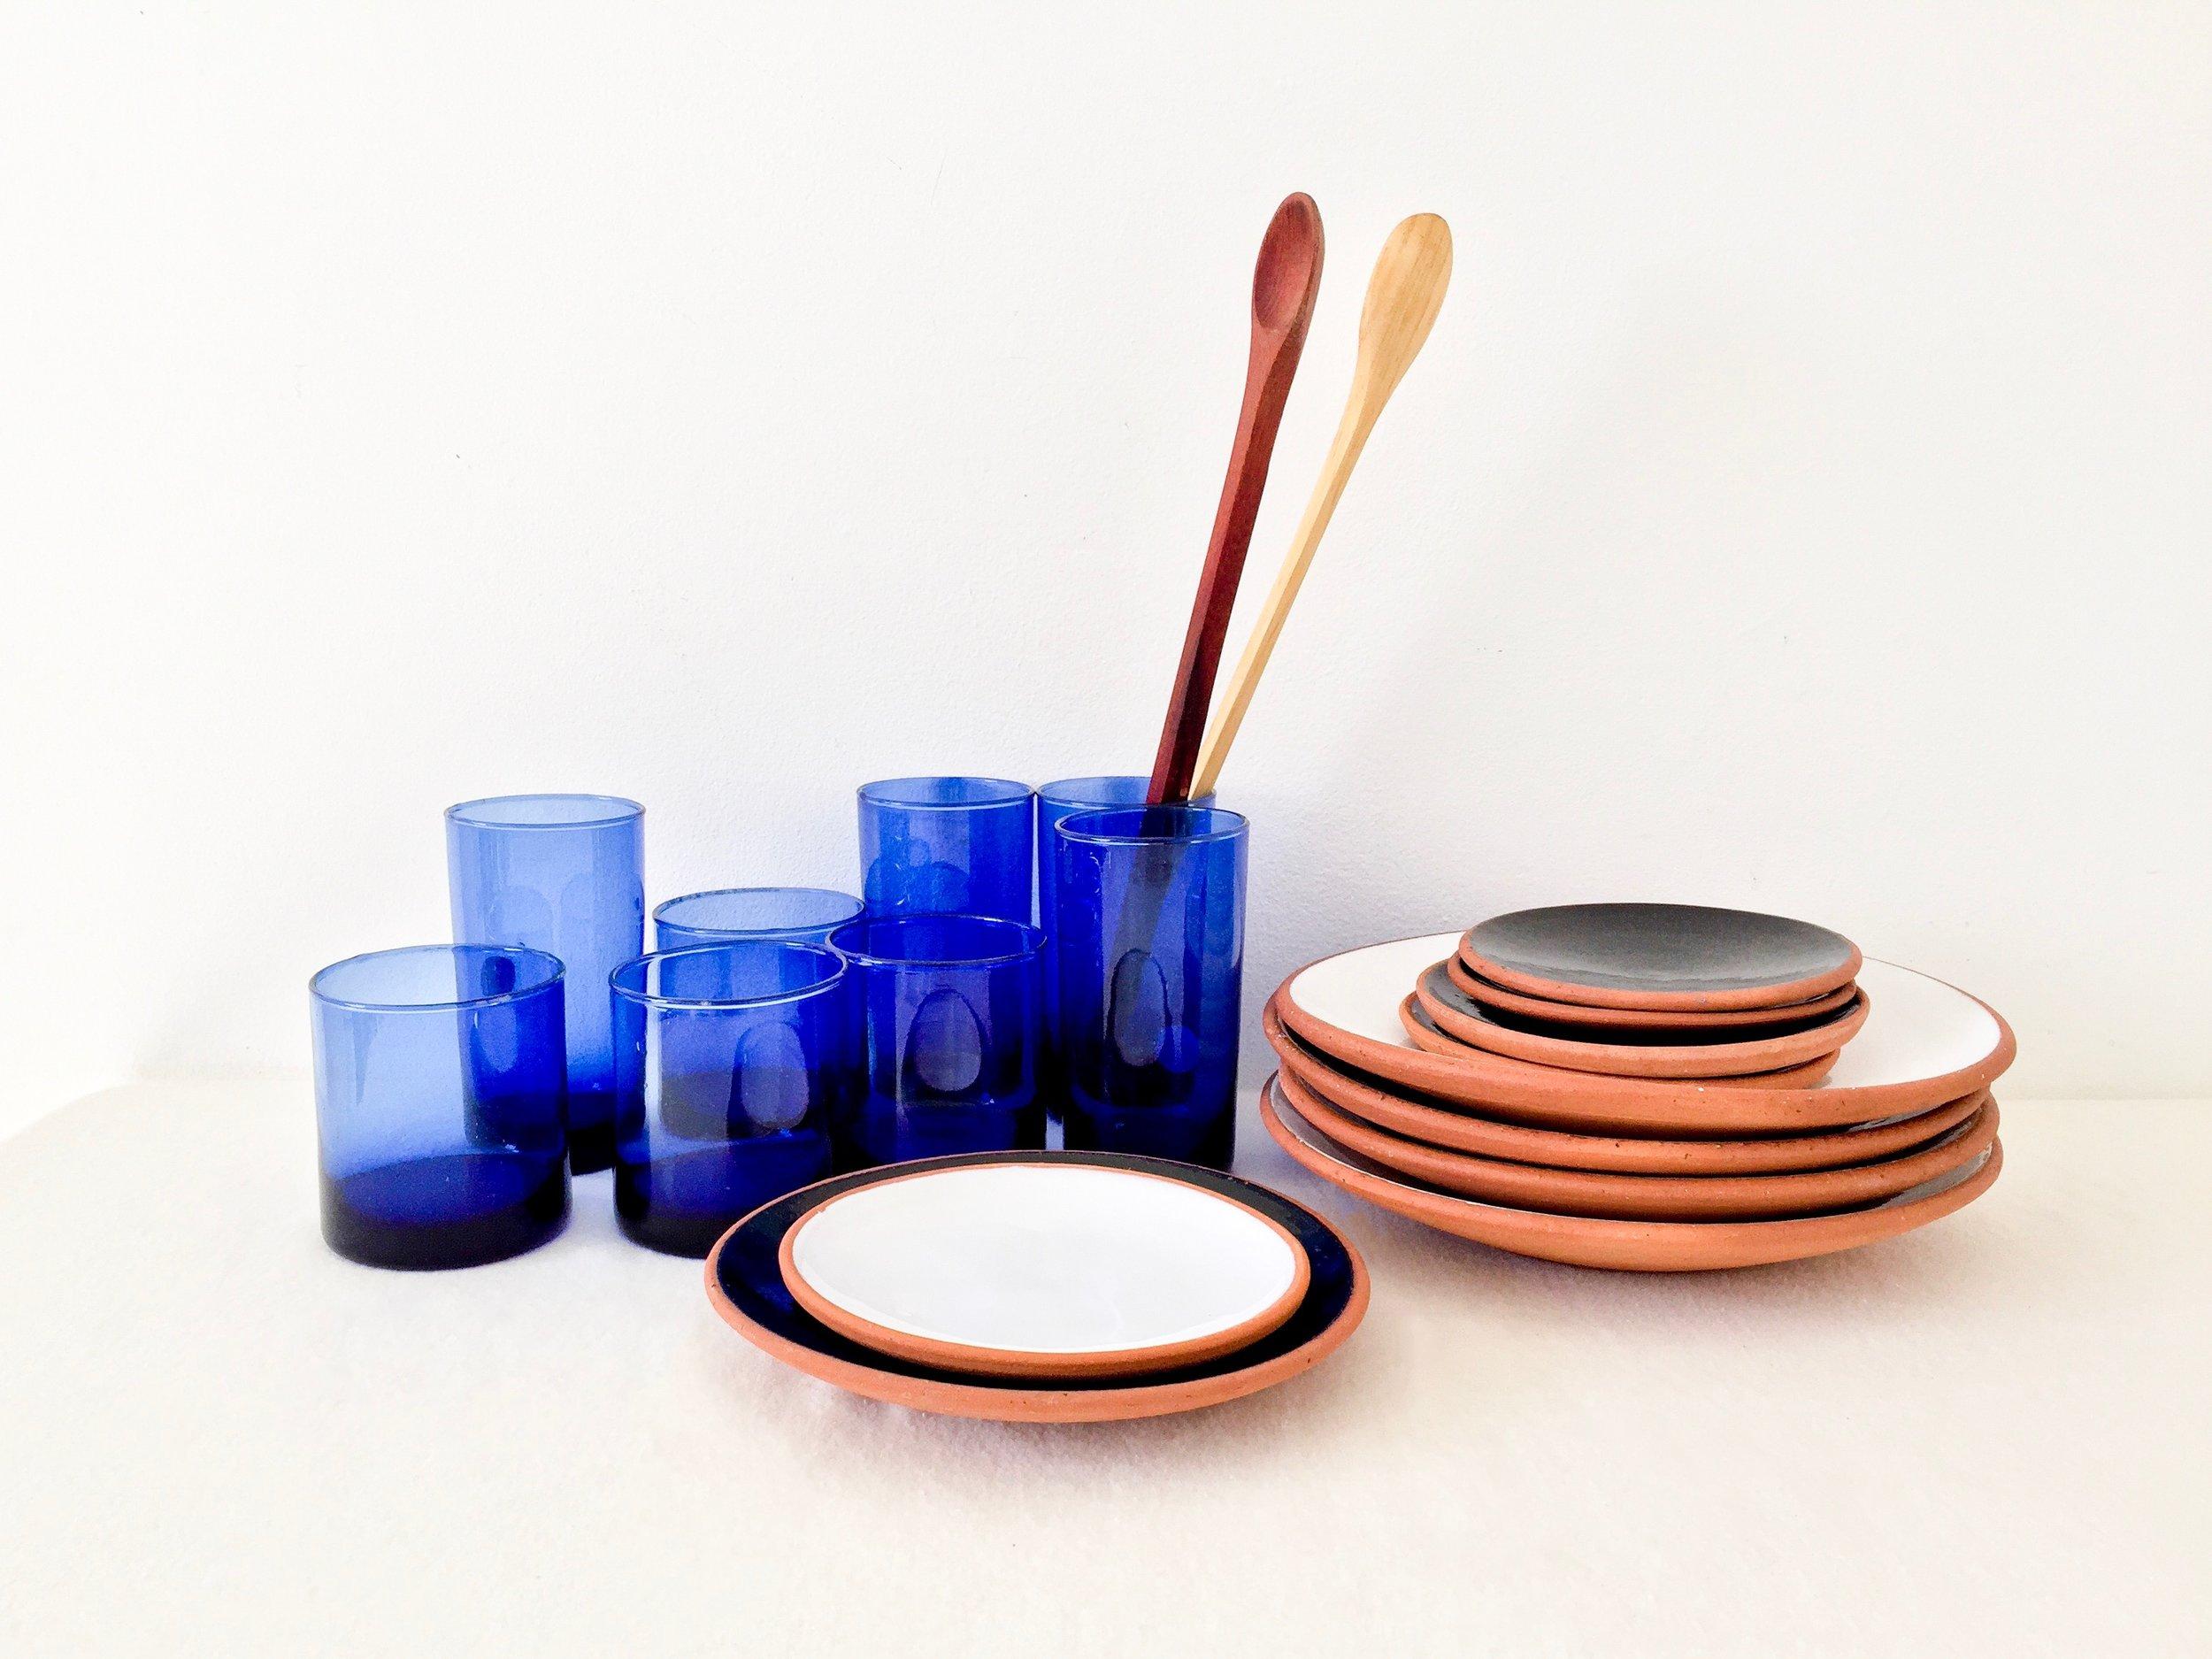 trasto colombian glassware red clay ceramics nazareno spoons.JPG